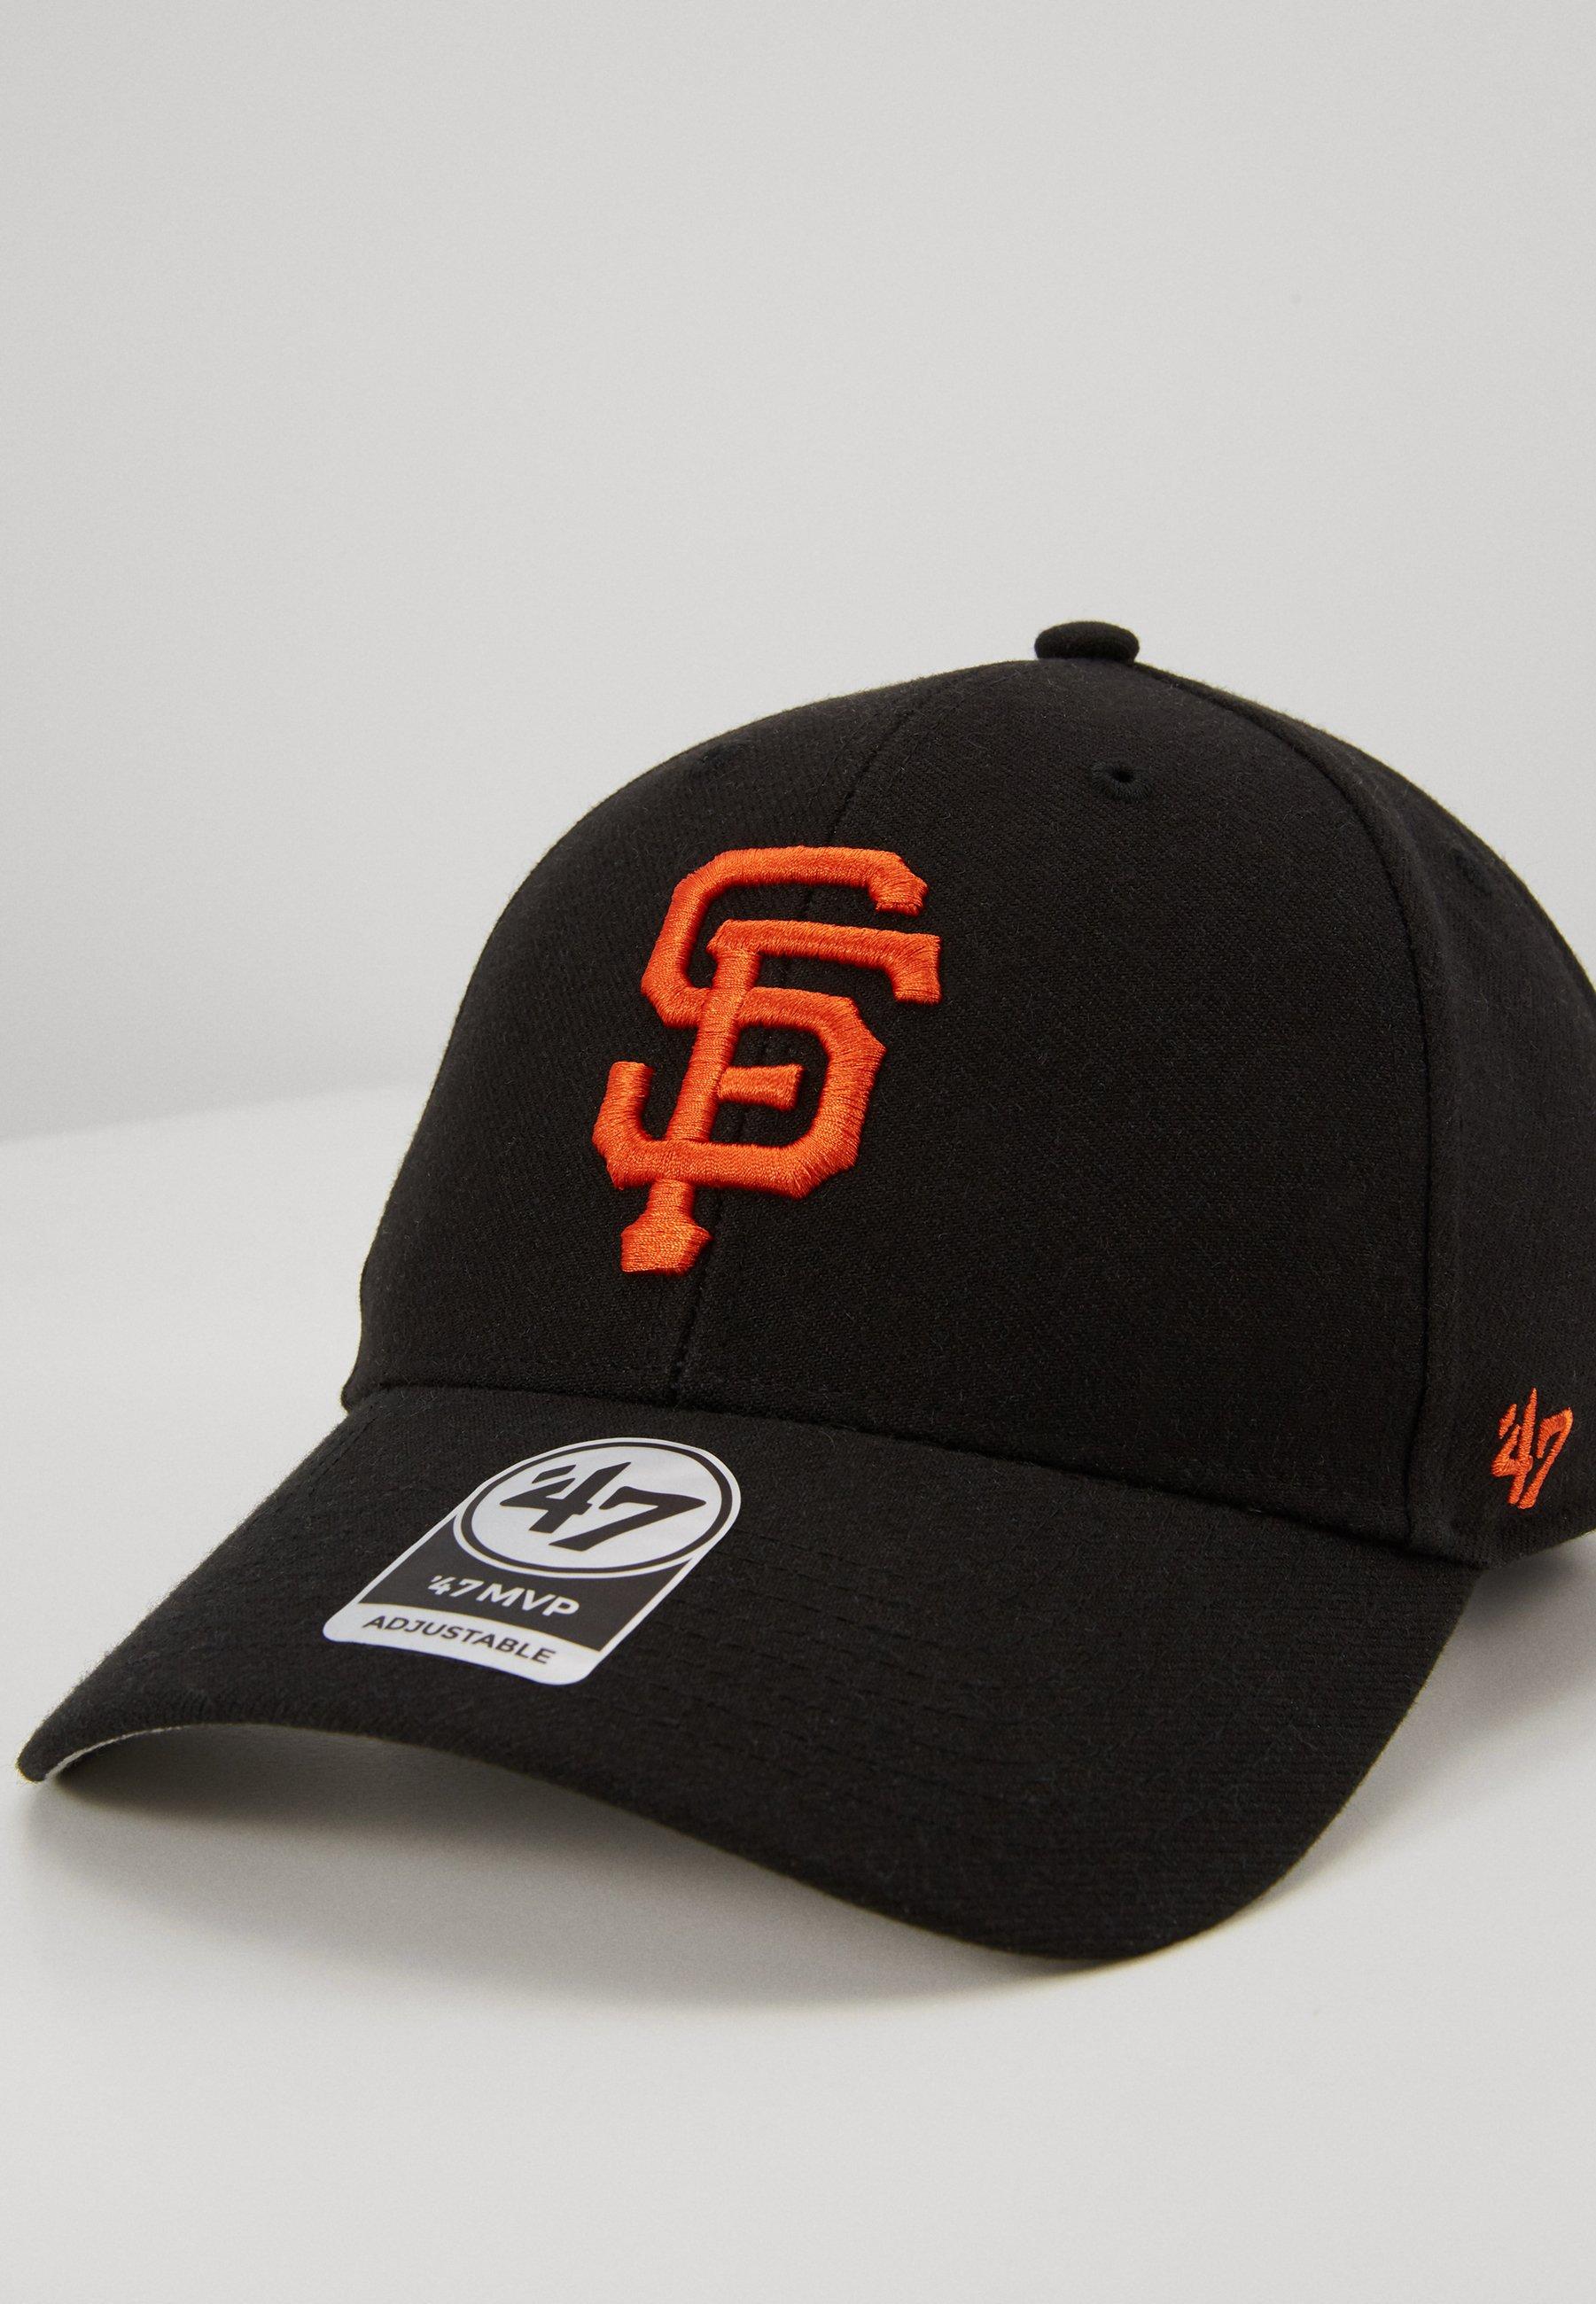 '47 SAN FRANCISCO GIANTS 47 - Cap - black/svart V2KzzqYvjofh7nu